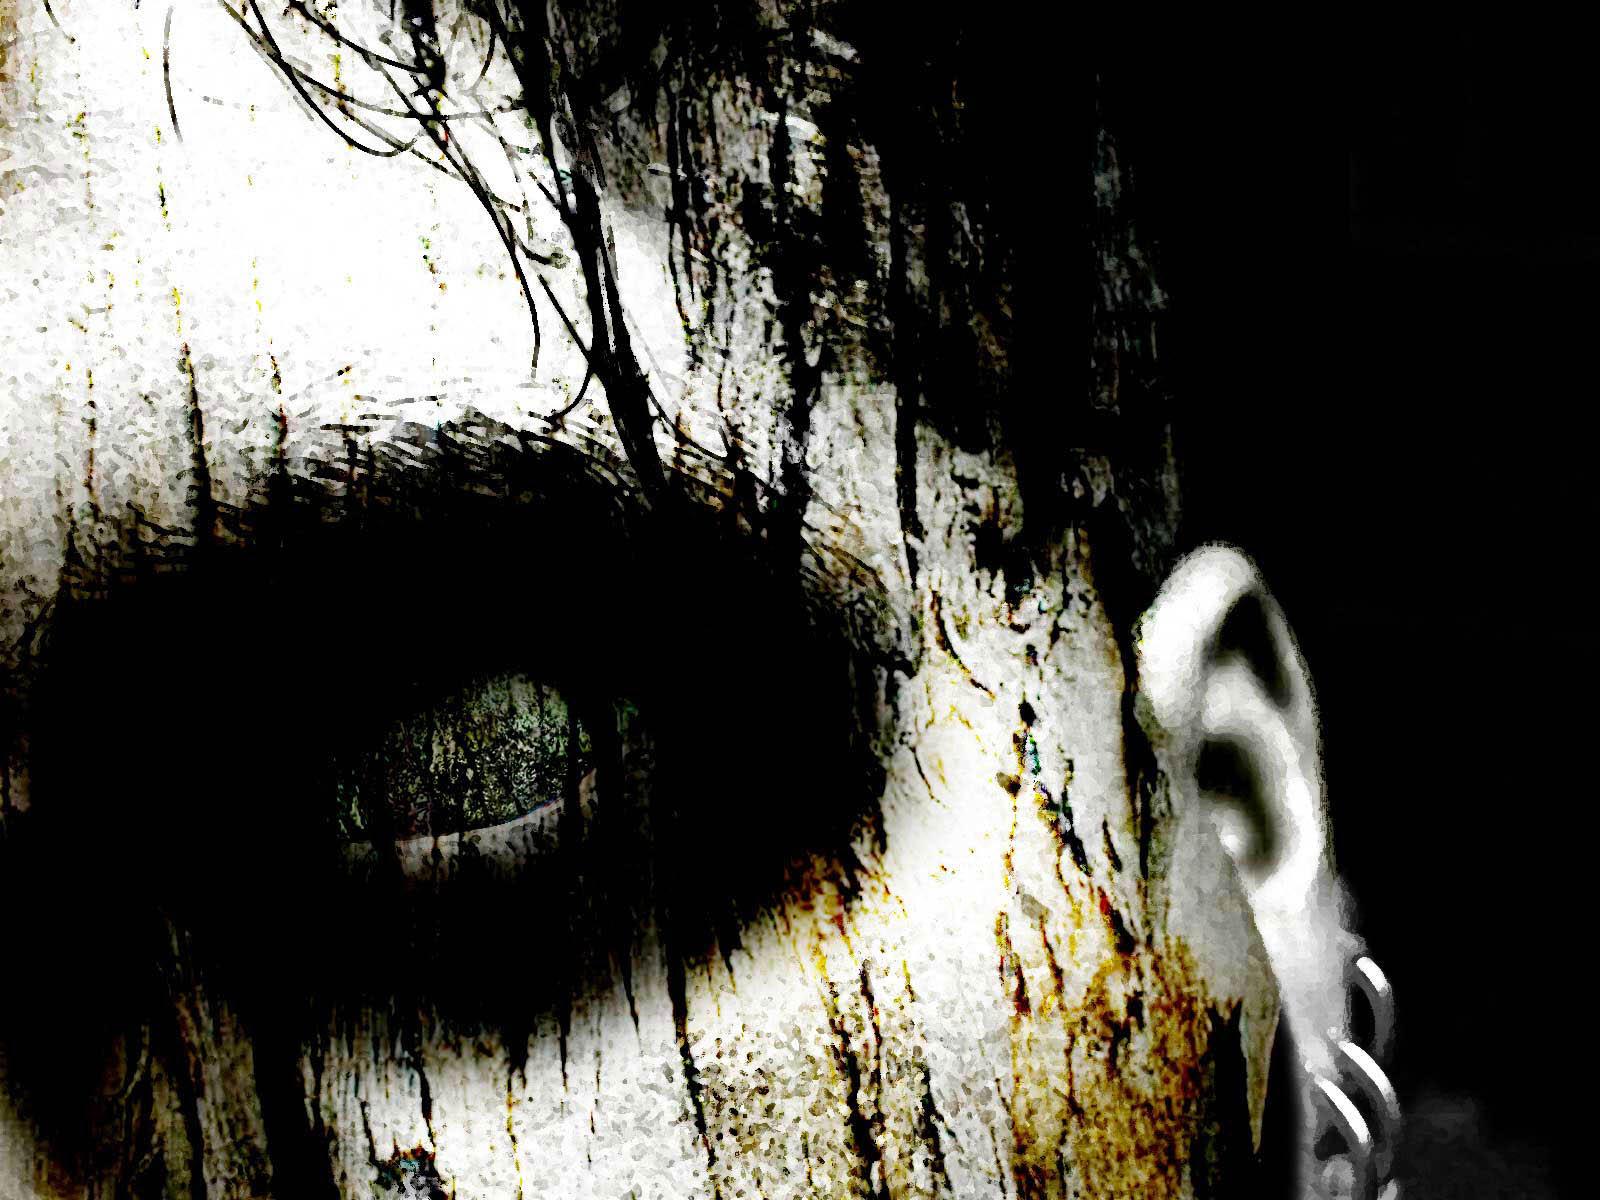 Horror Desktop Wallpapers Scary Horror Desktop Backgrounds Images 1600x1200